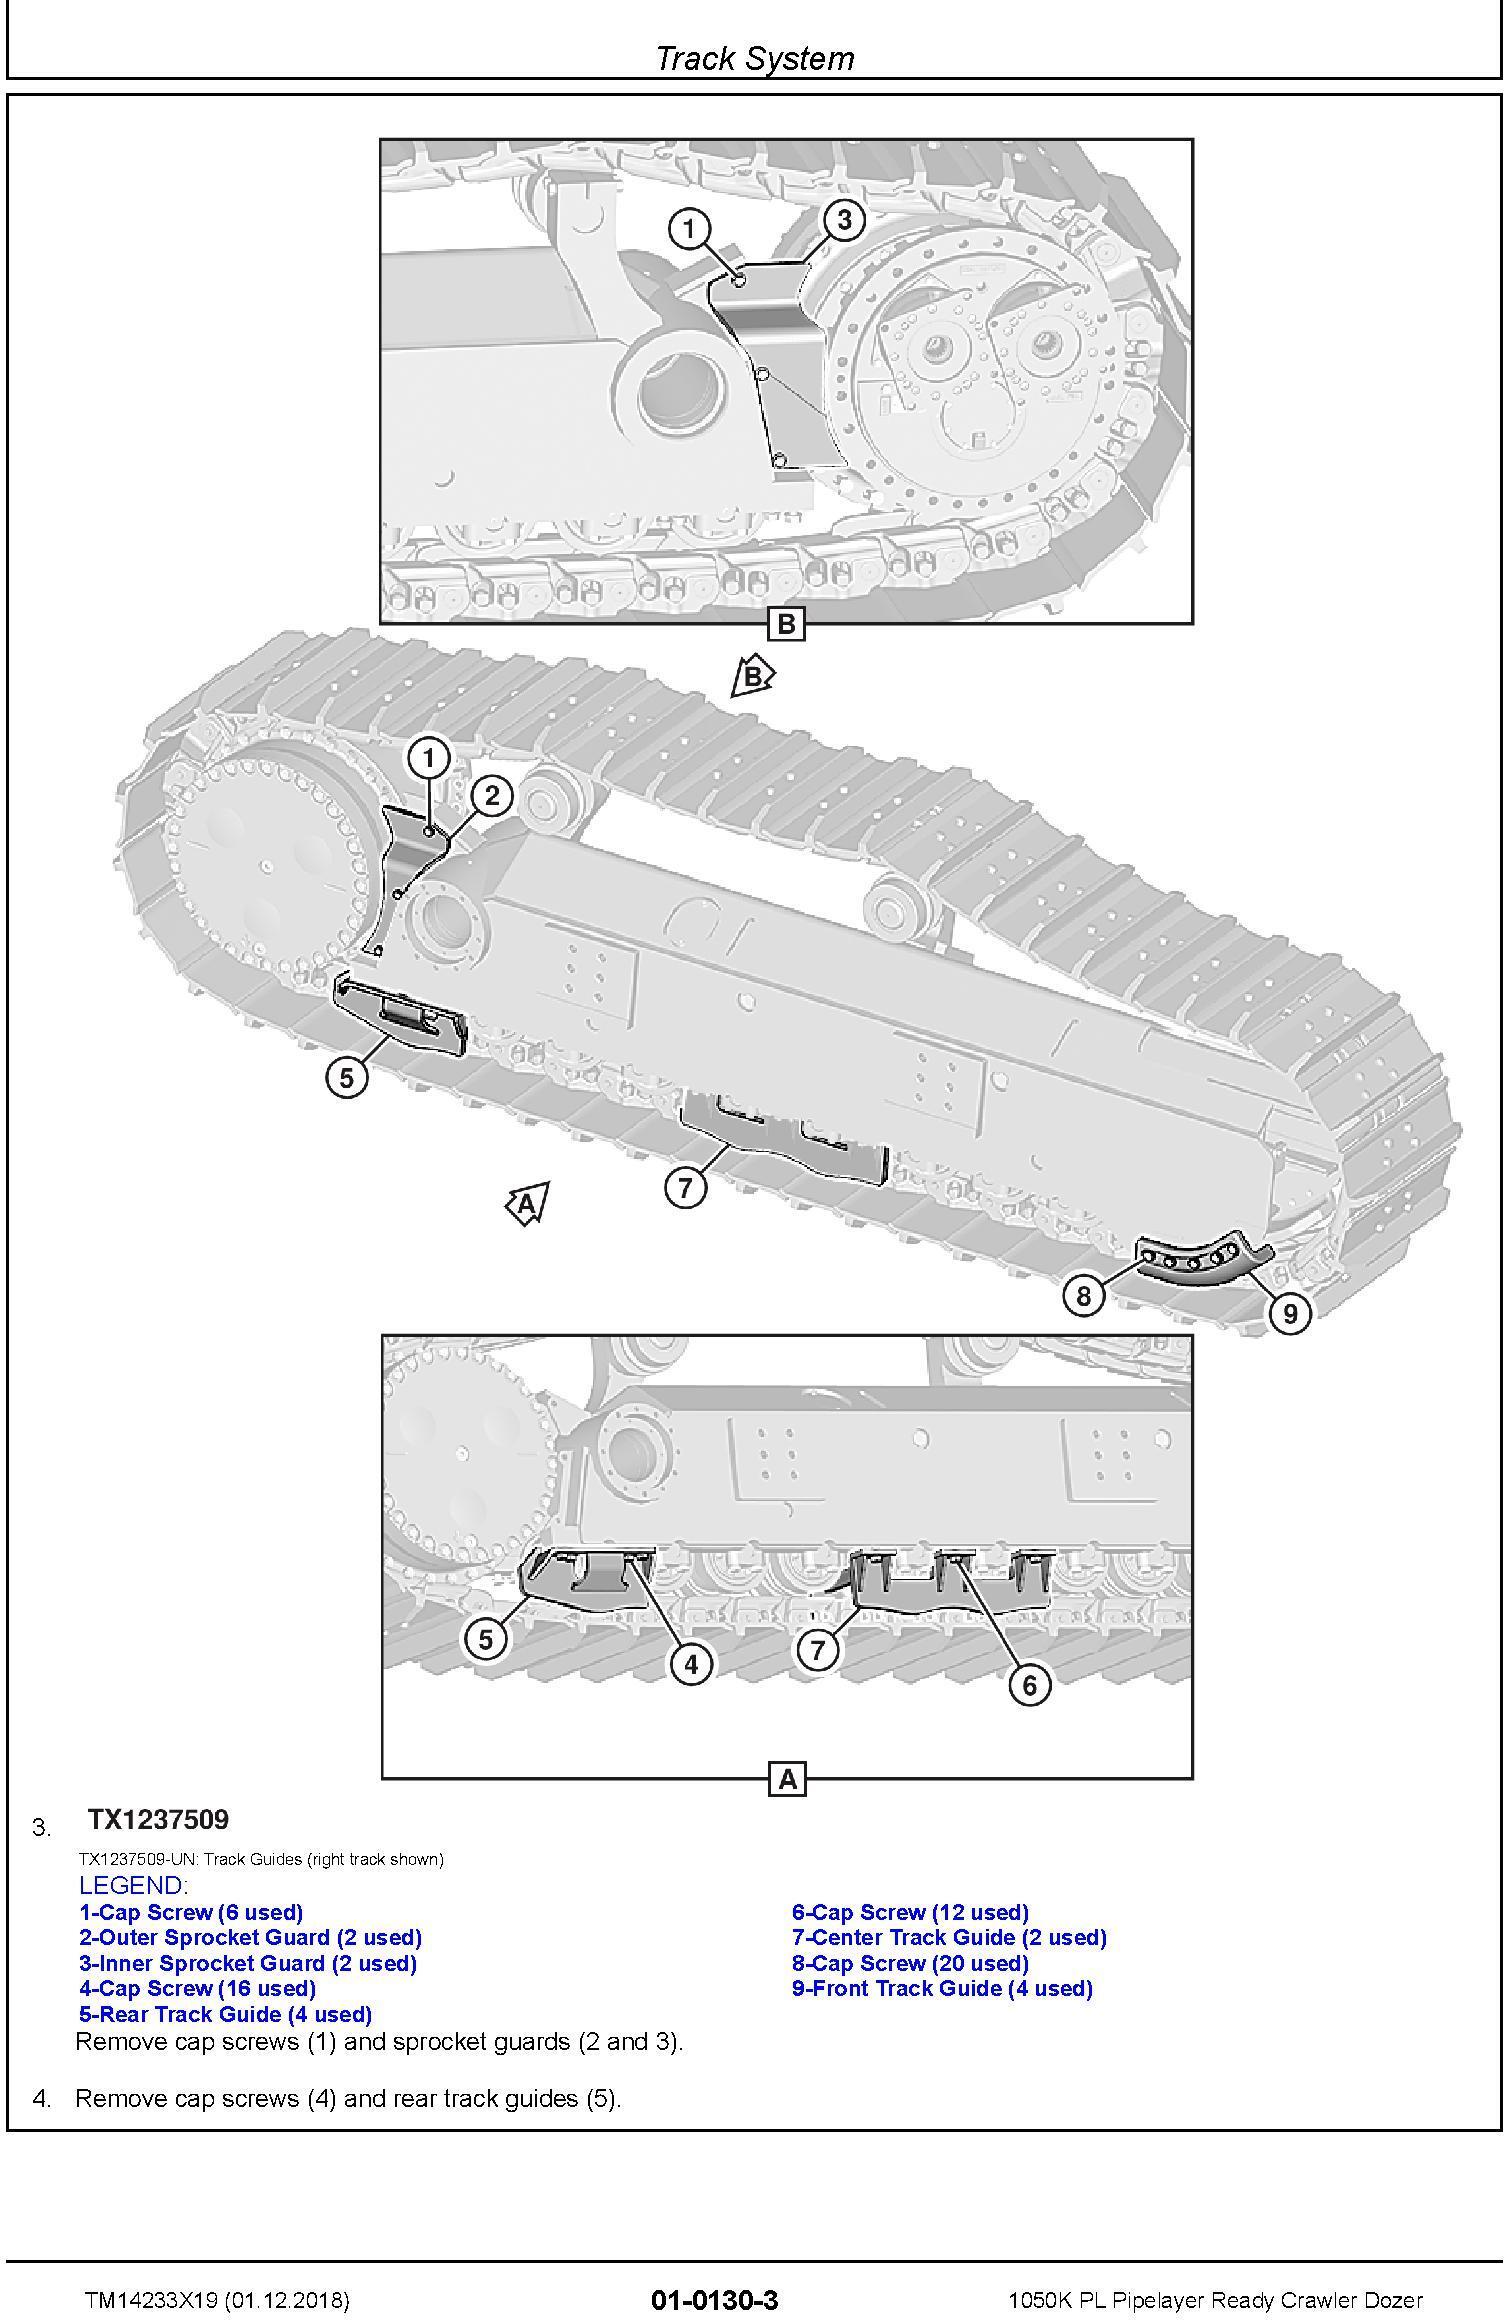 John Deere 1050K PL (SN. F310922-318801) Pipelayer Ready Crawler Dozer Repair Manual (TM14233X19) - 1